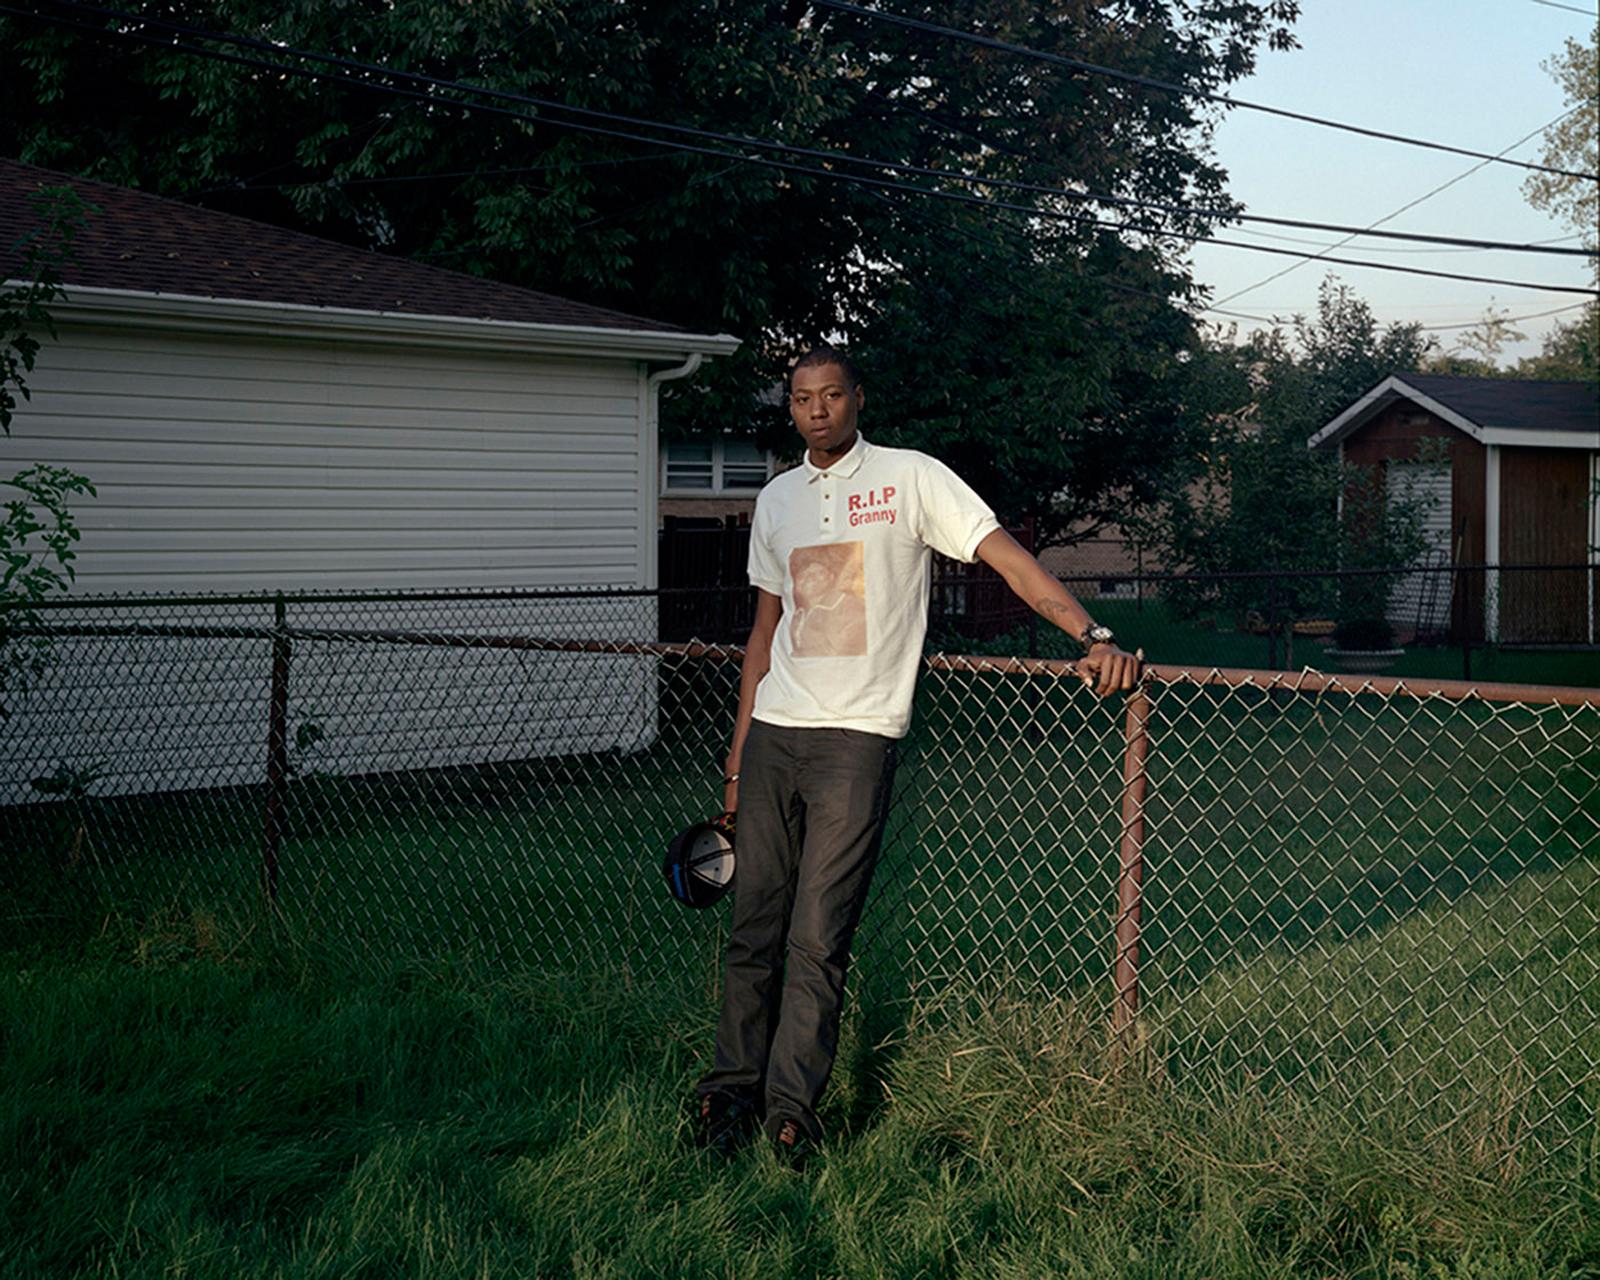 Stacey Dalton, IL, 2014 ©Juan Giraldo